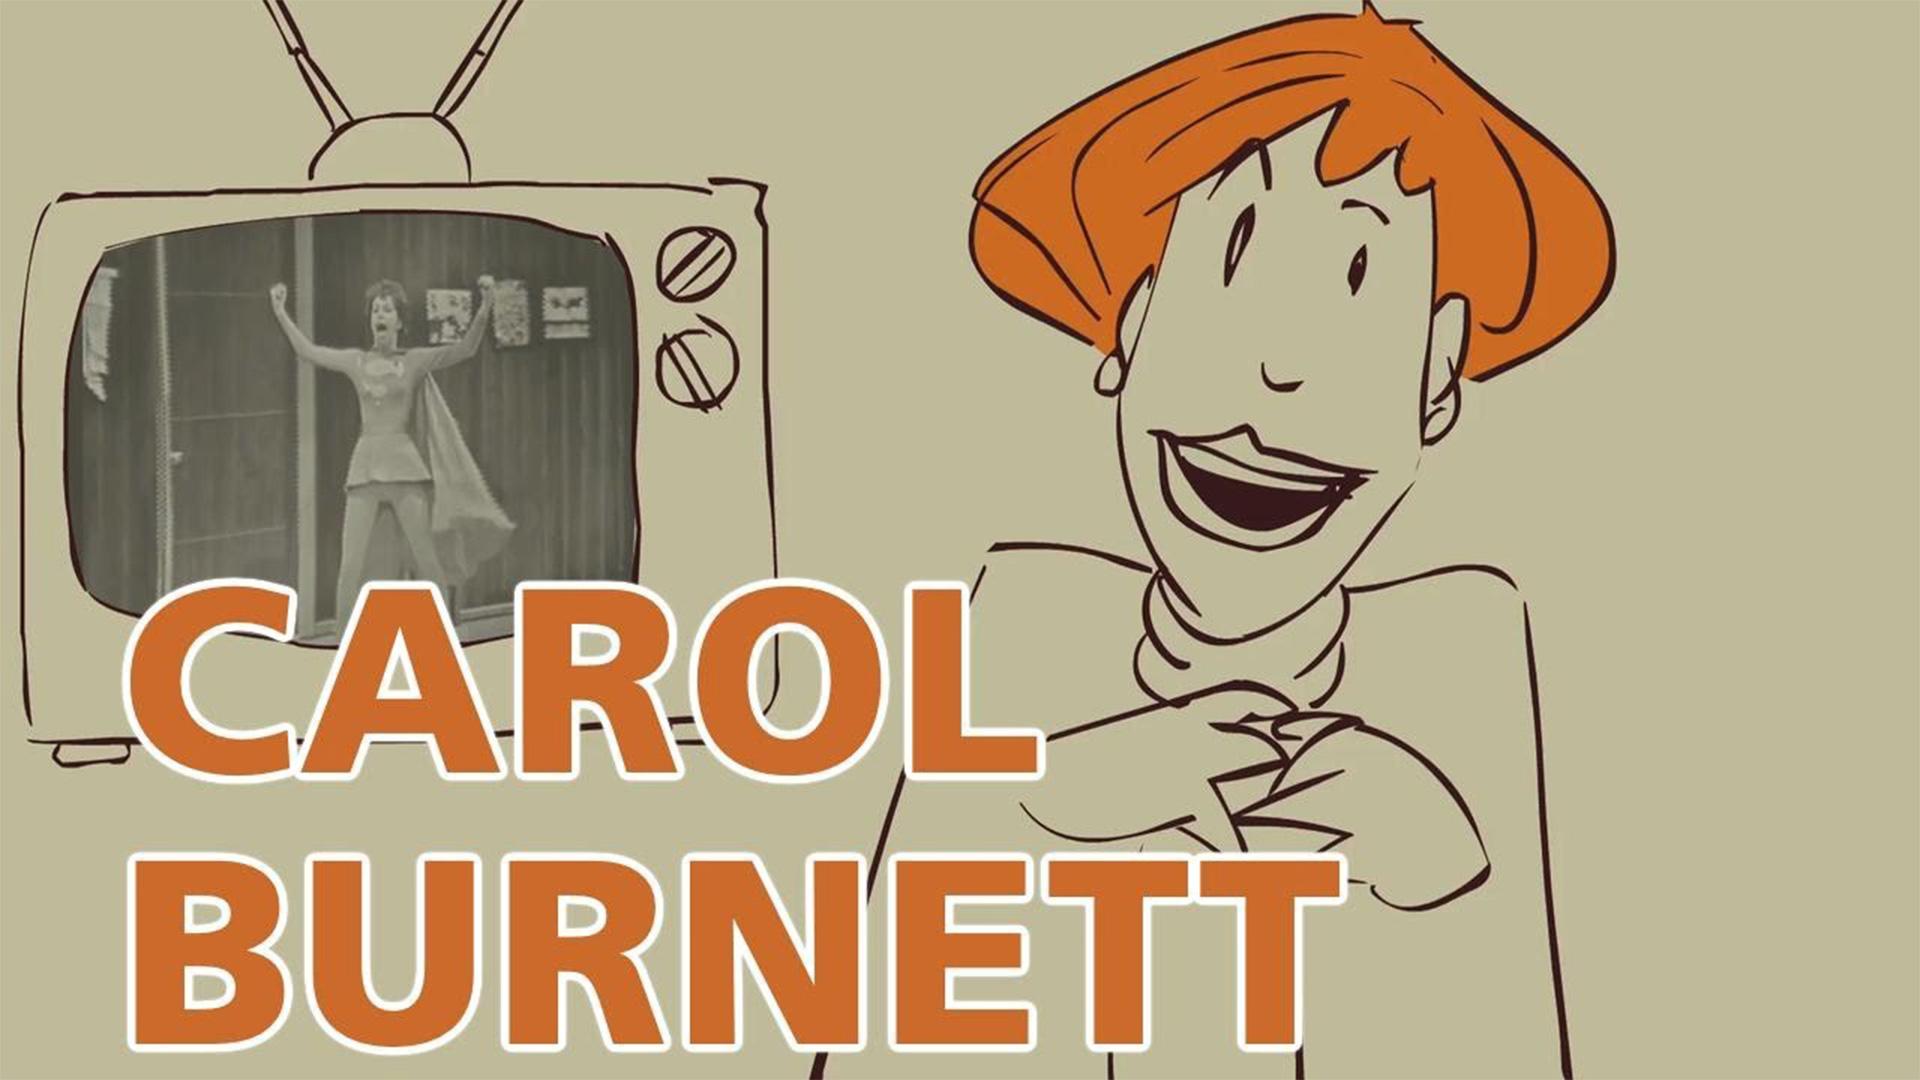 Carol Burnett blank on blank